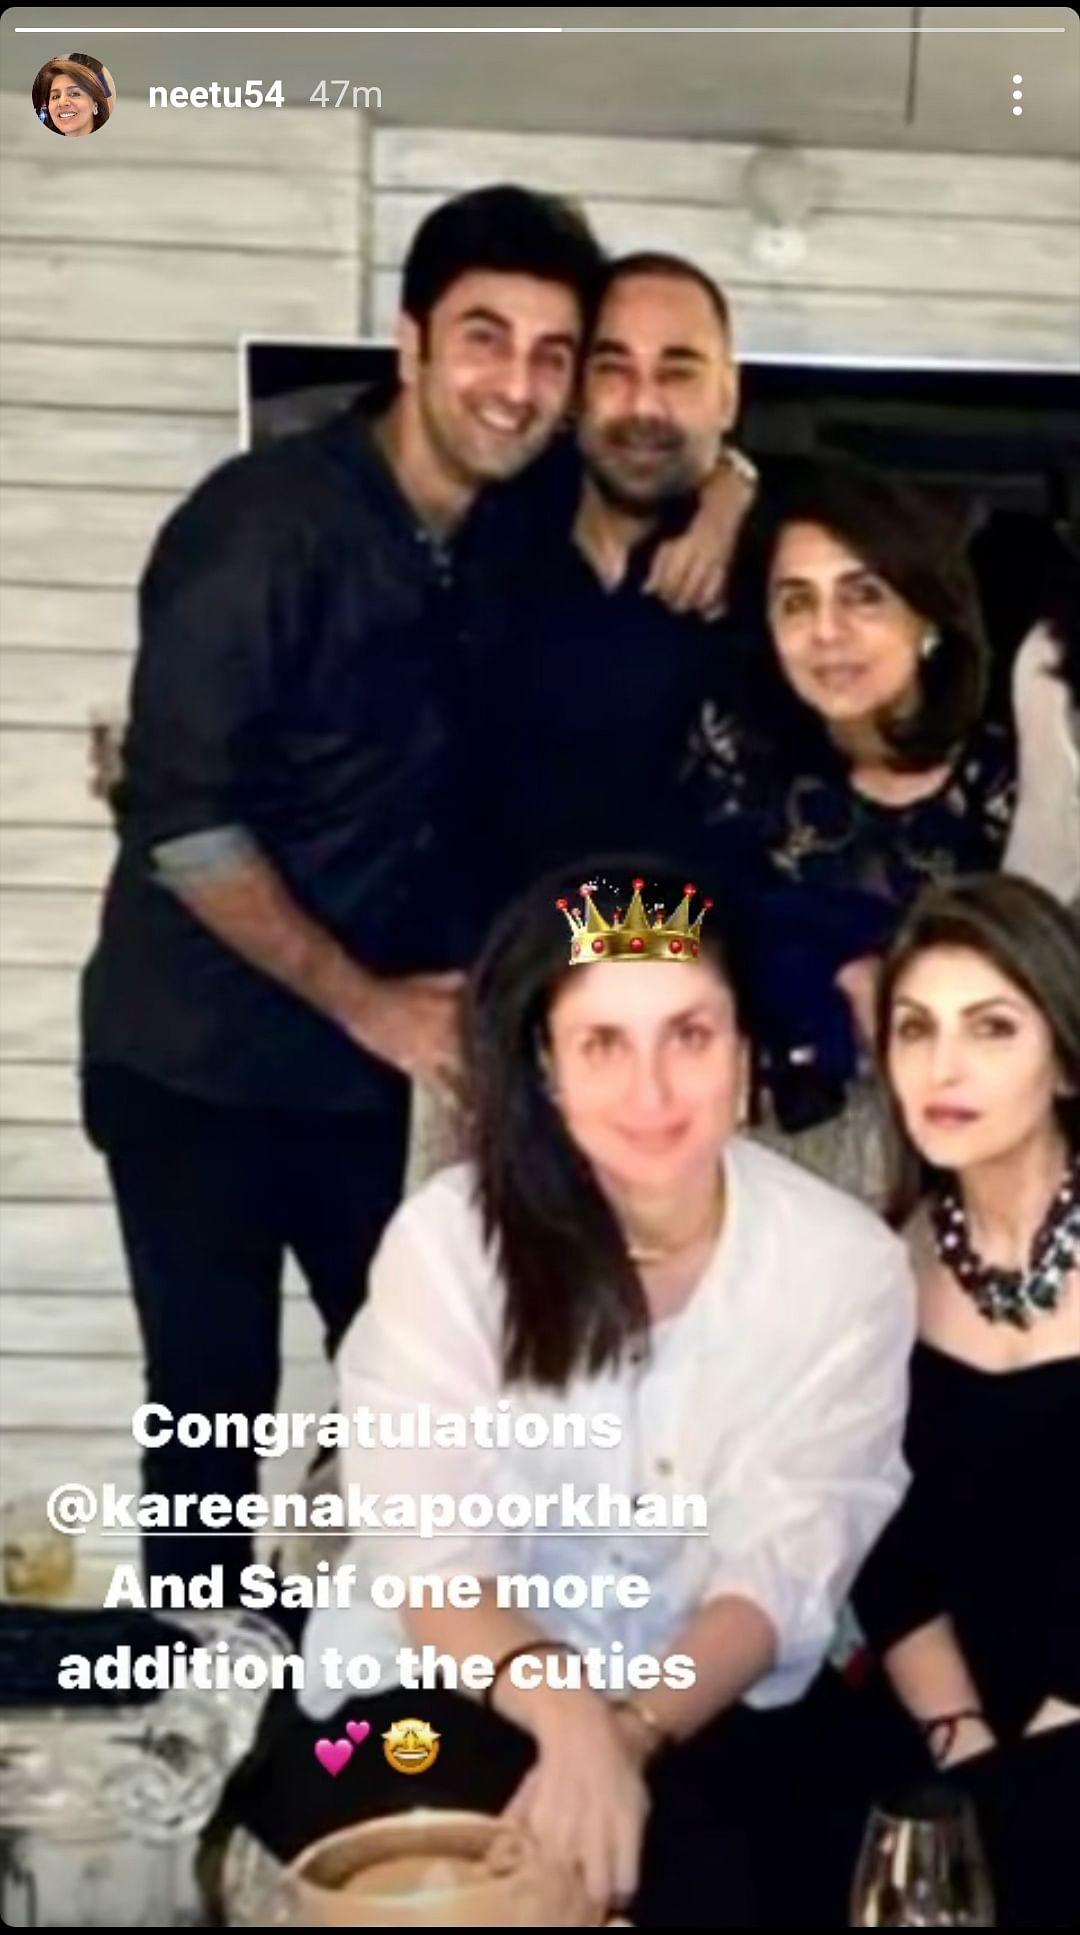 Karisma, Riddhima, Neetu Kapoor Congratulate Saif & Kareena